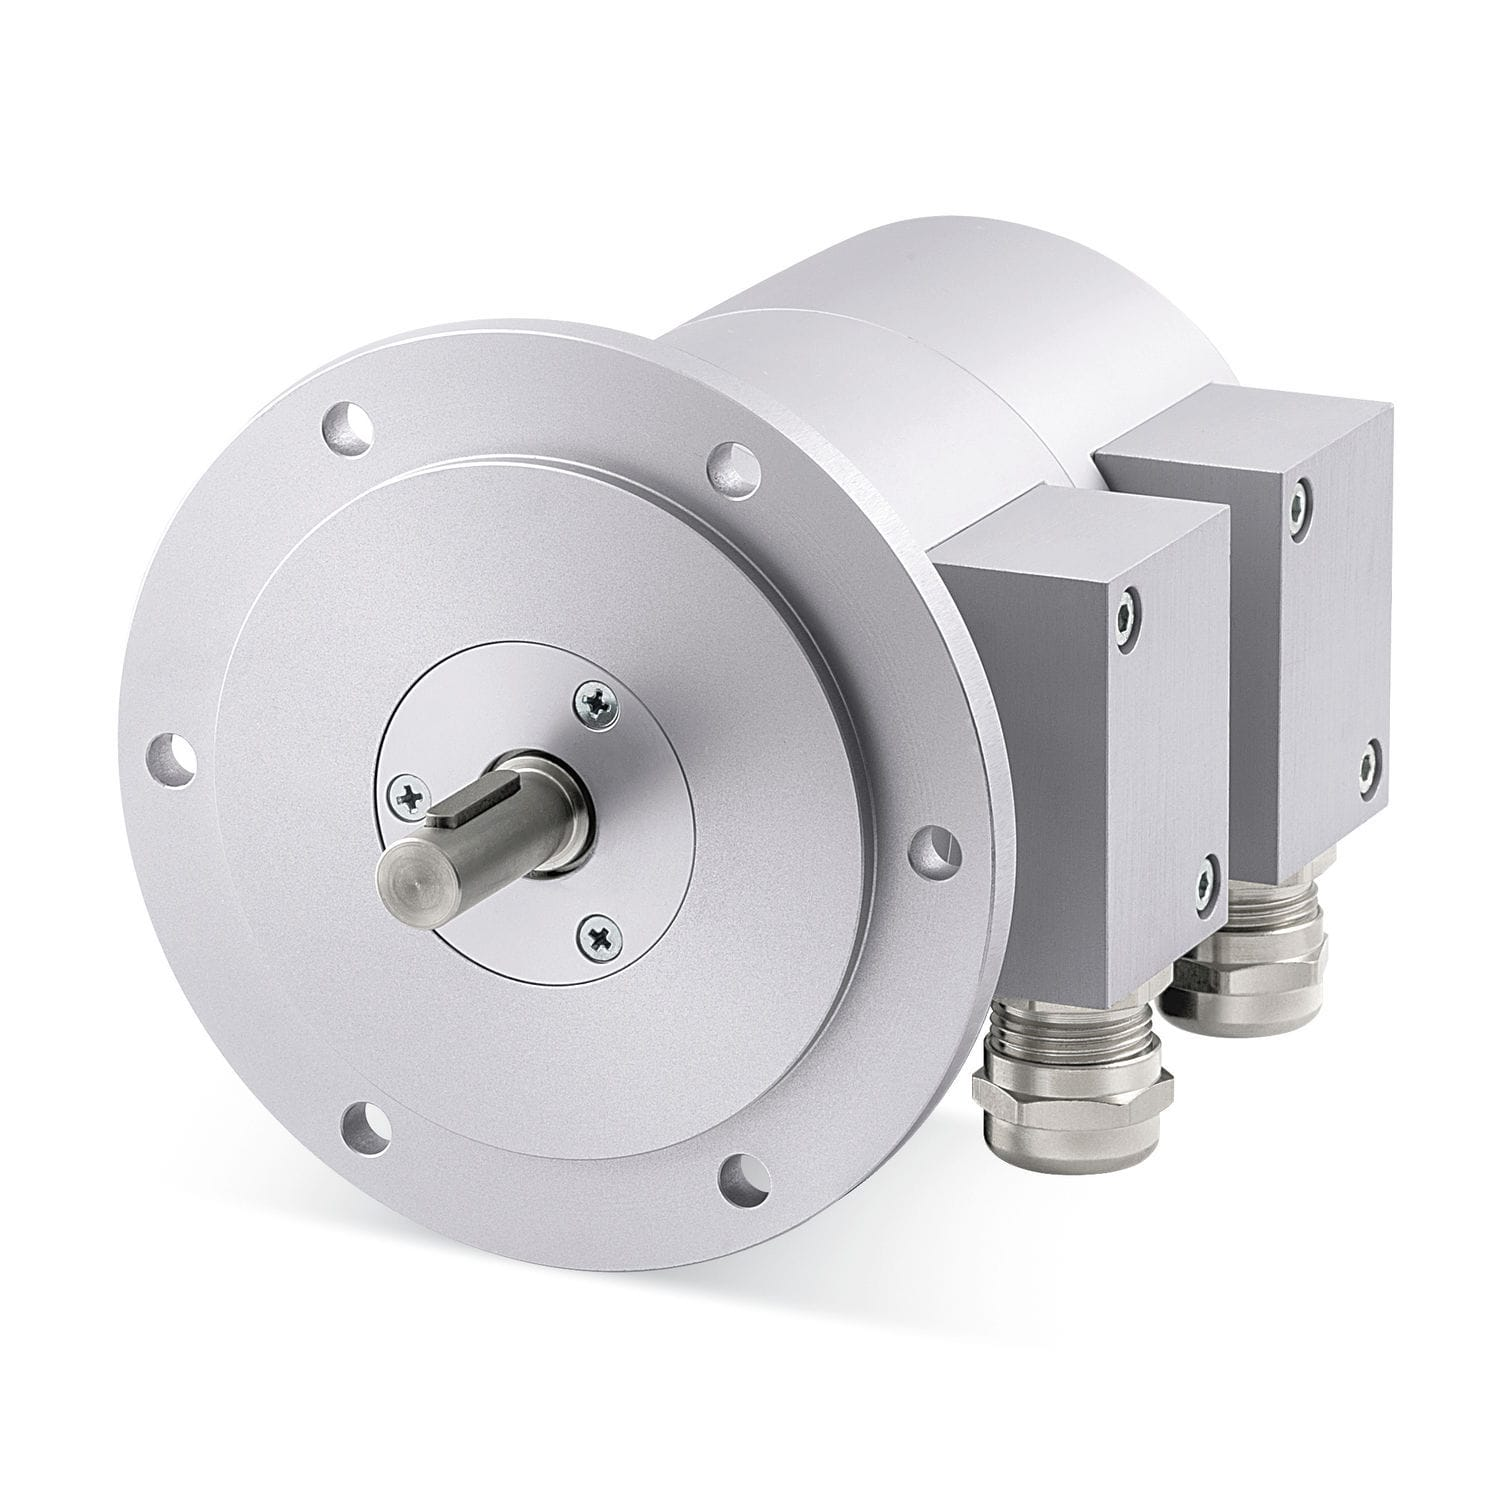 Incremental rotary encoder / solid-shaft / redundant